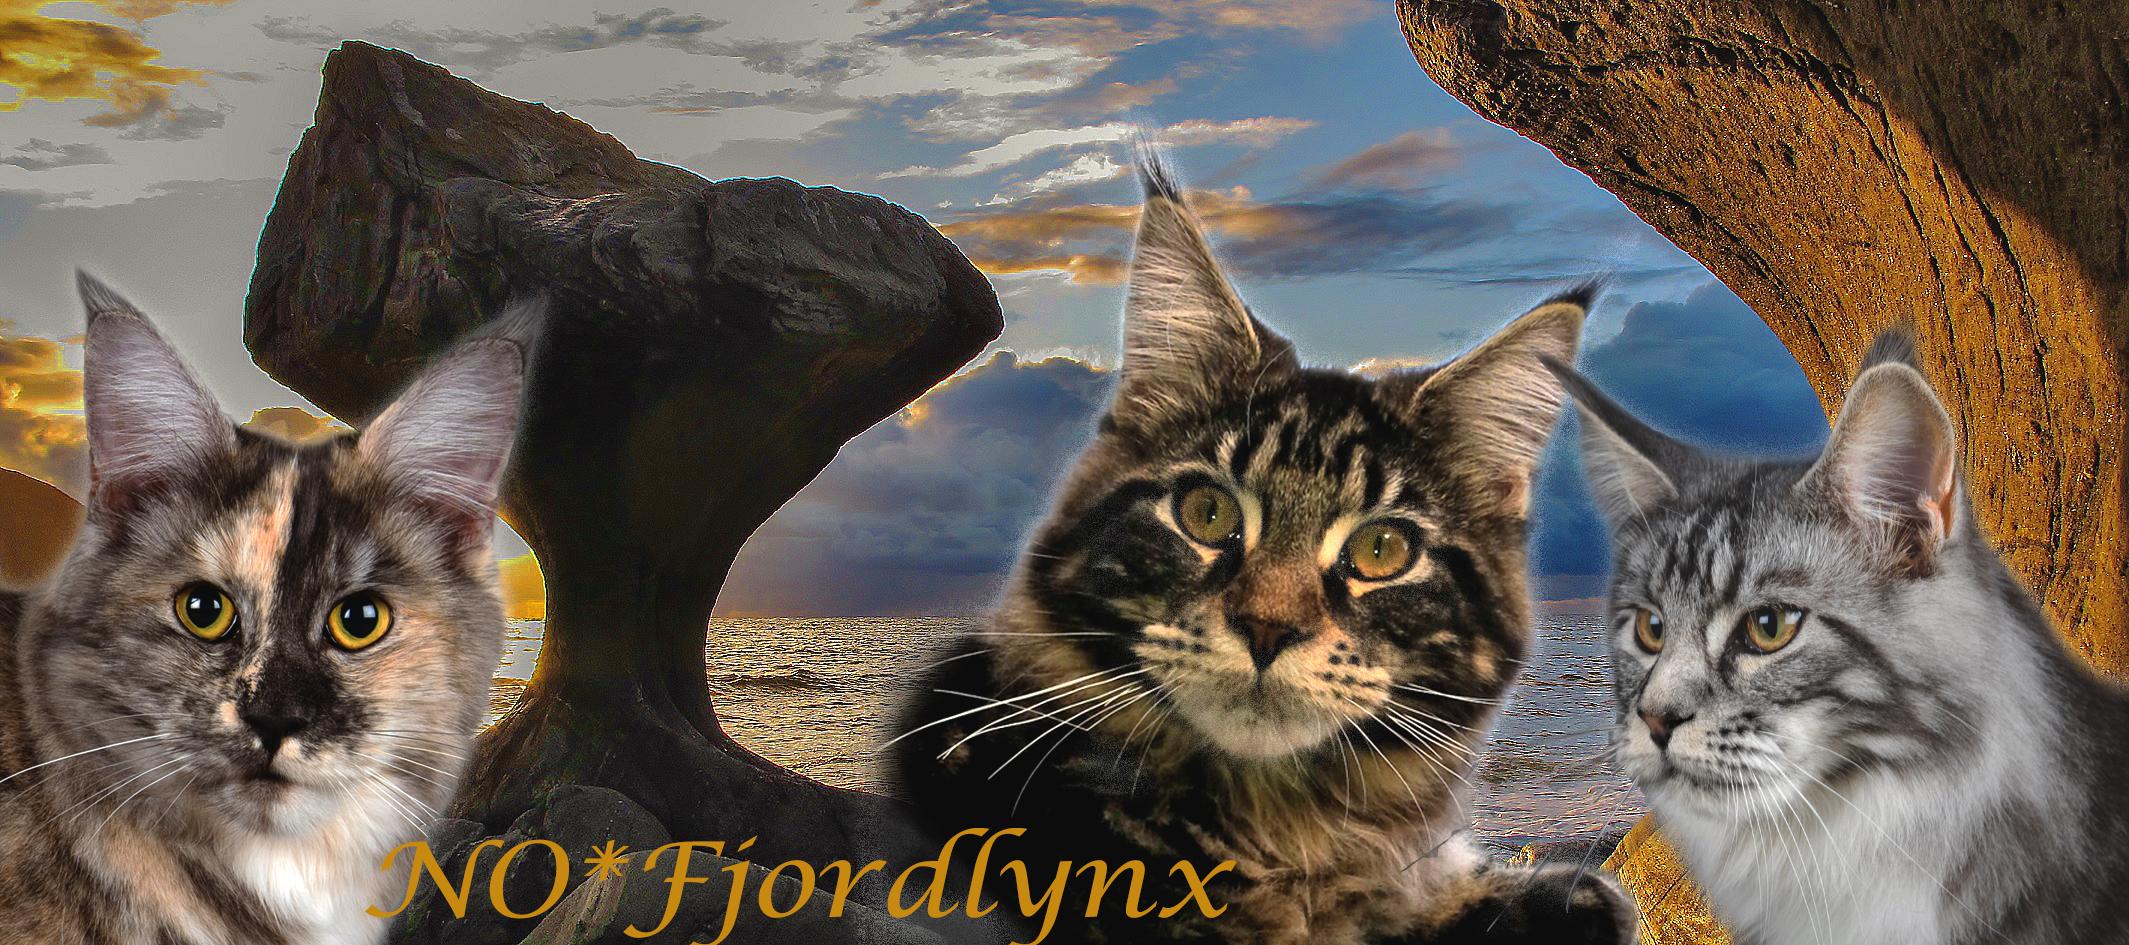 NO*Fjordlynx